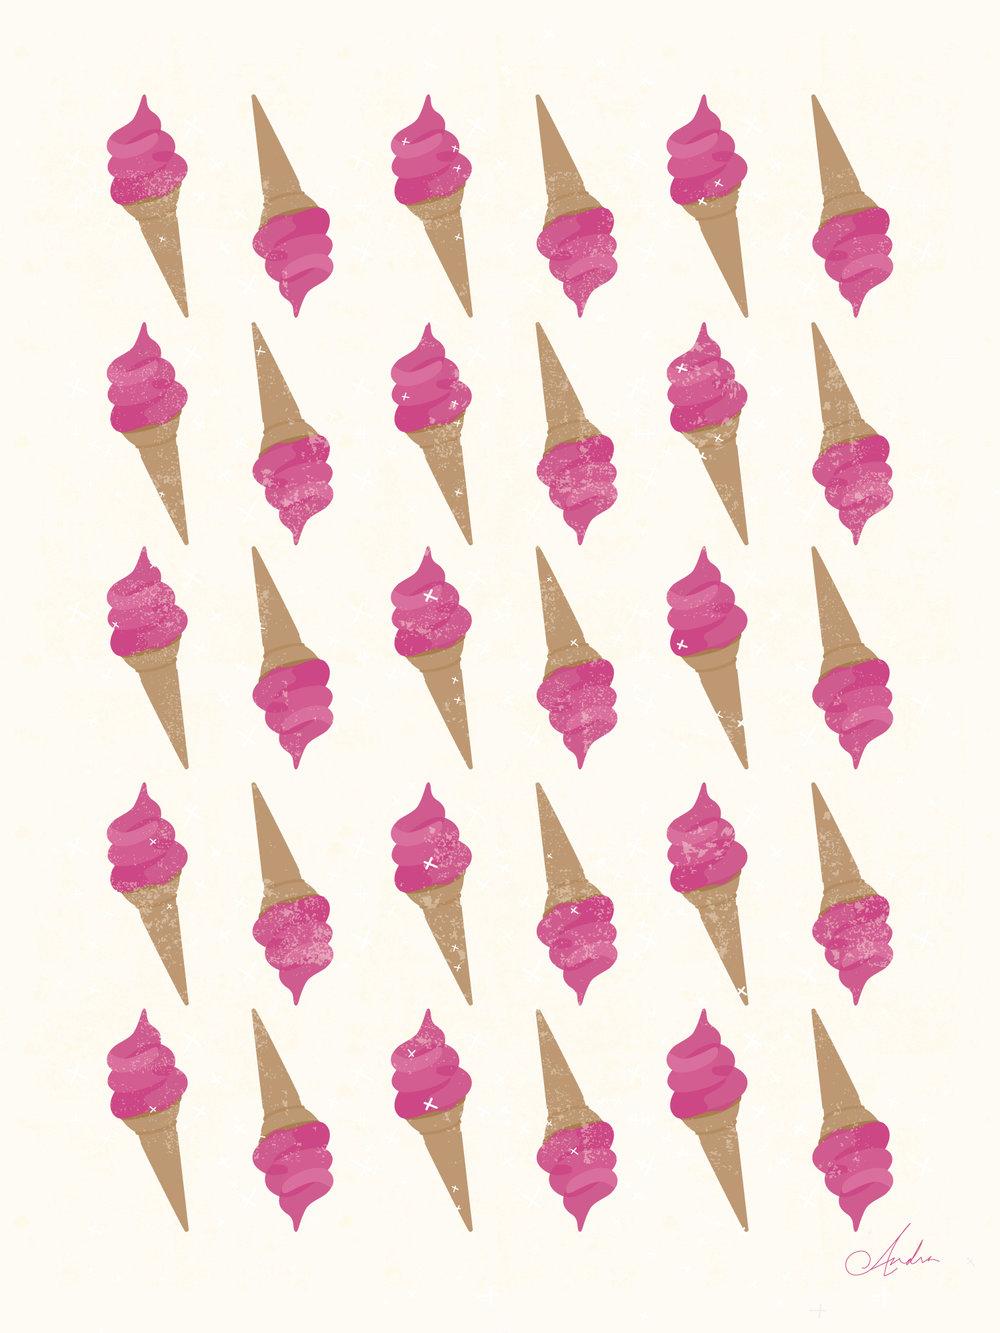 rhubarb_sorbet_illustration.jpg